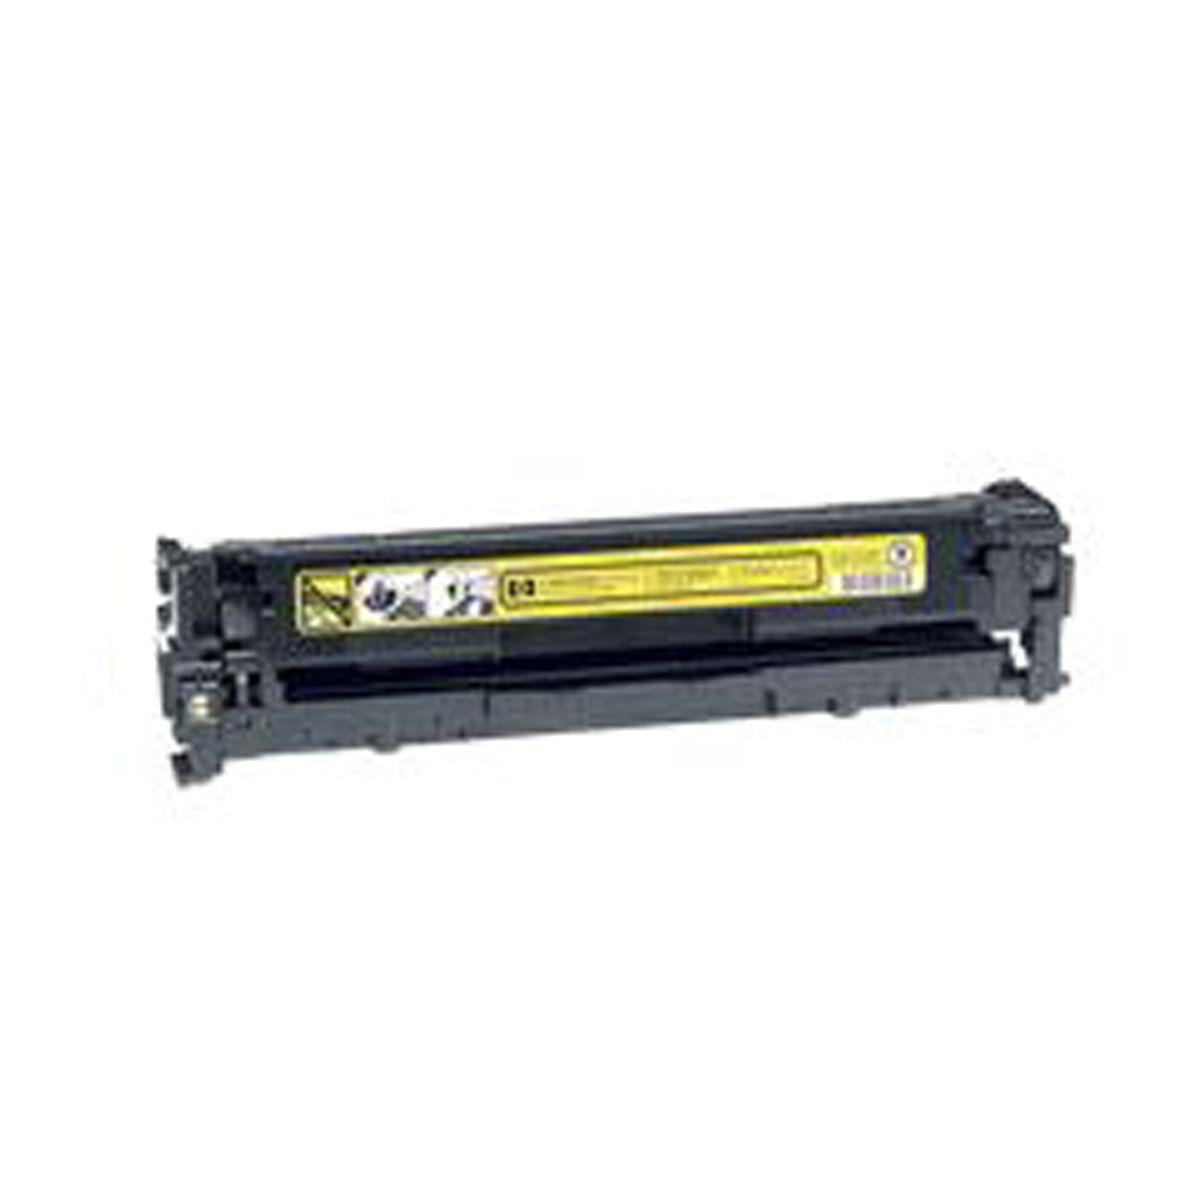 Toner Compativel com HP CB542A CB542 542 - 125A - Amarelo - CP1215 CP1510 CP1515 CP1518 CM1312 - 1,4K